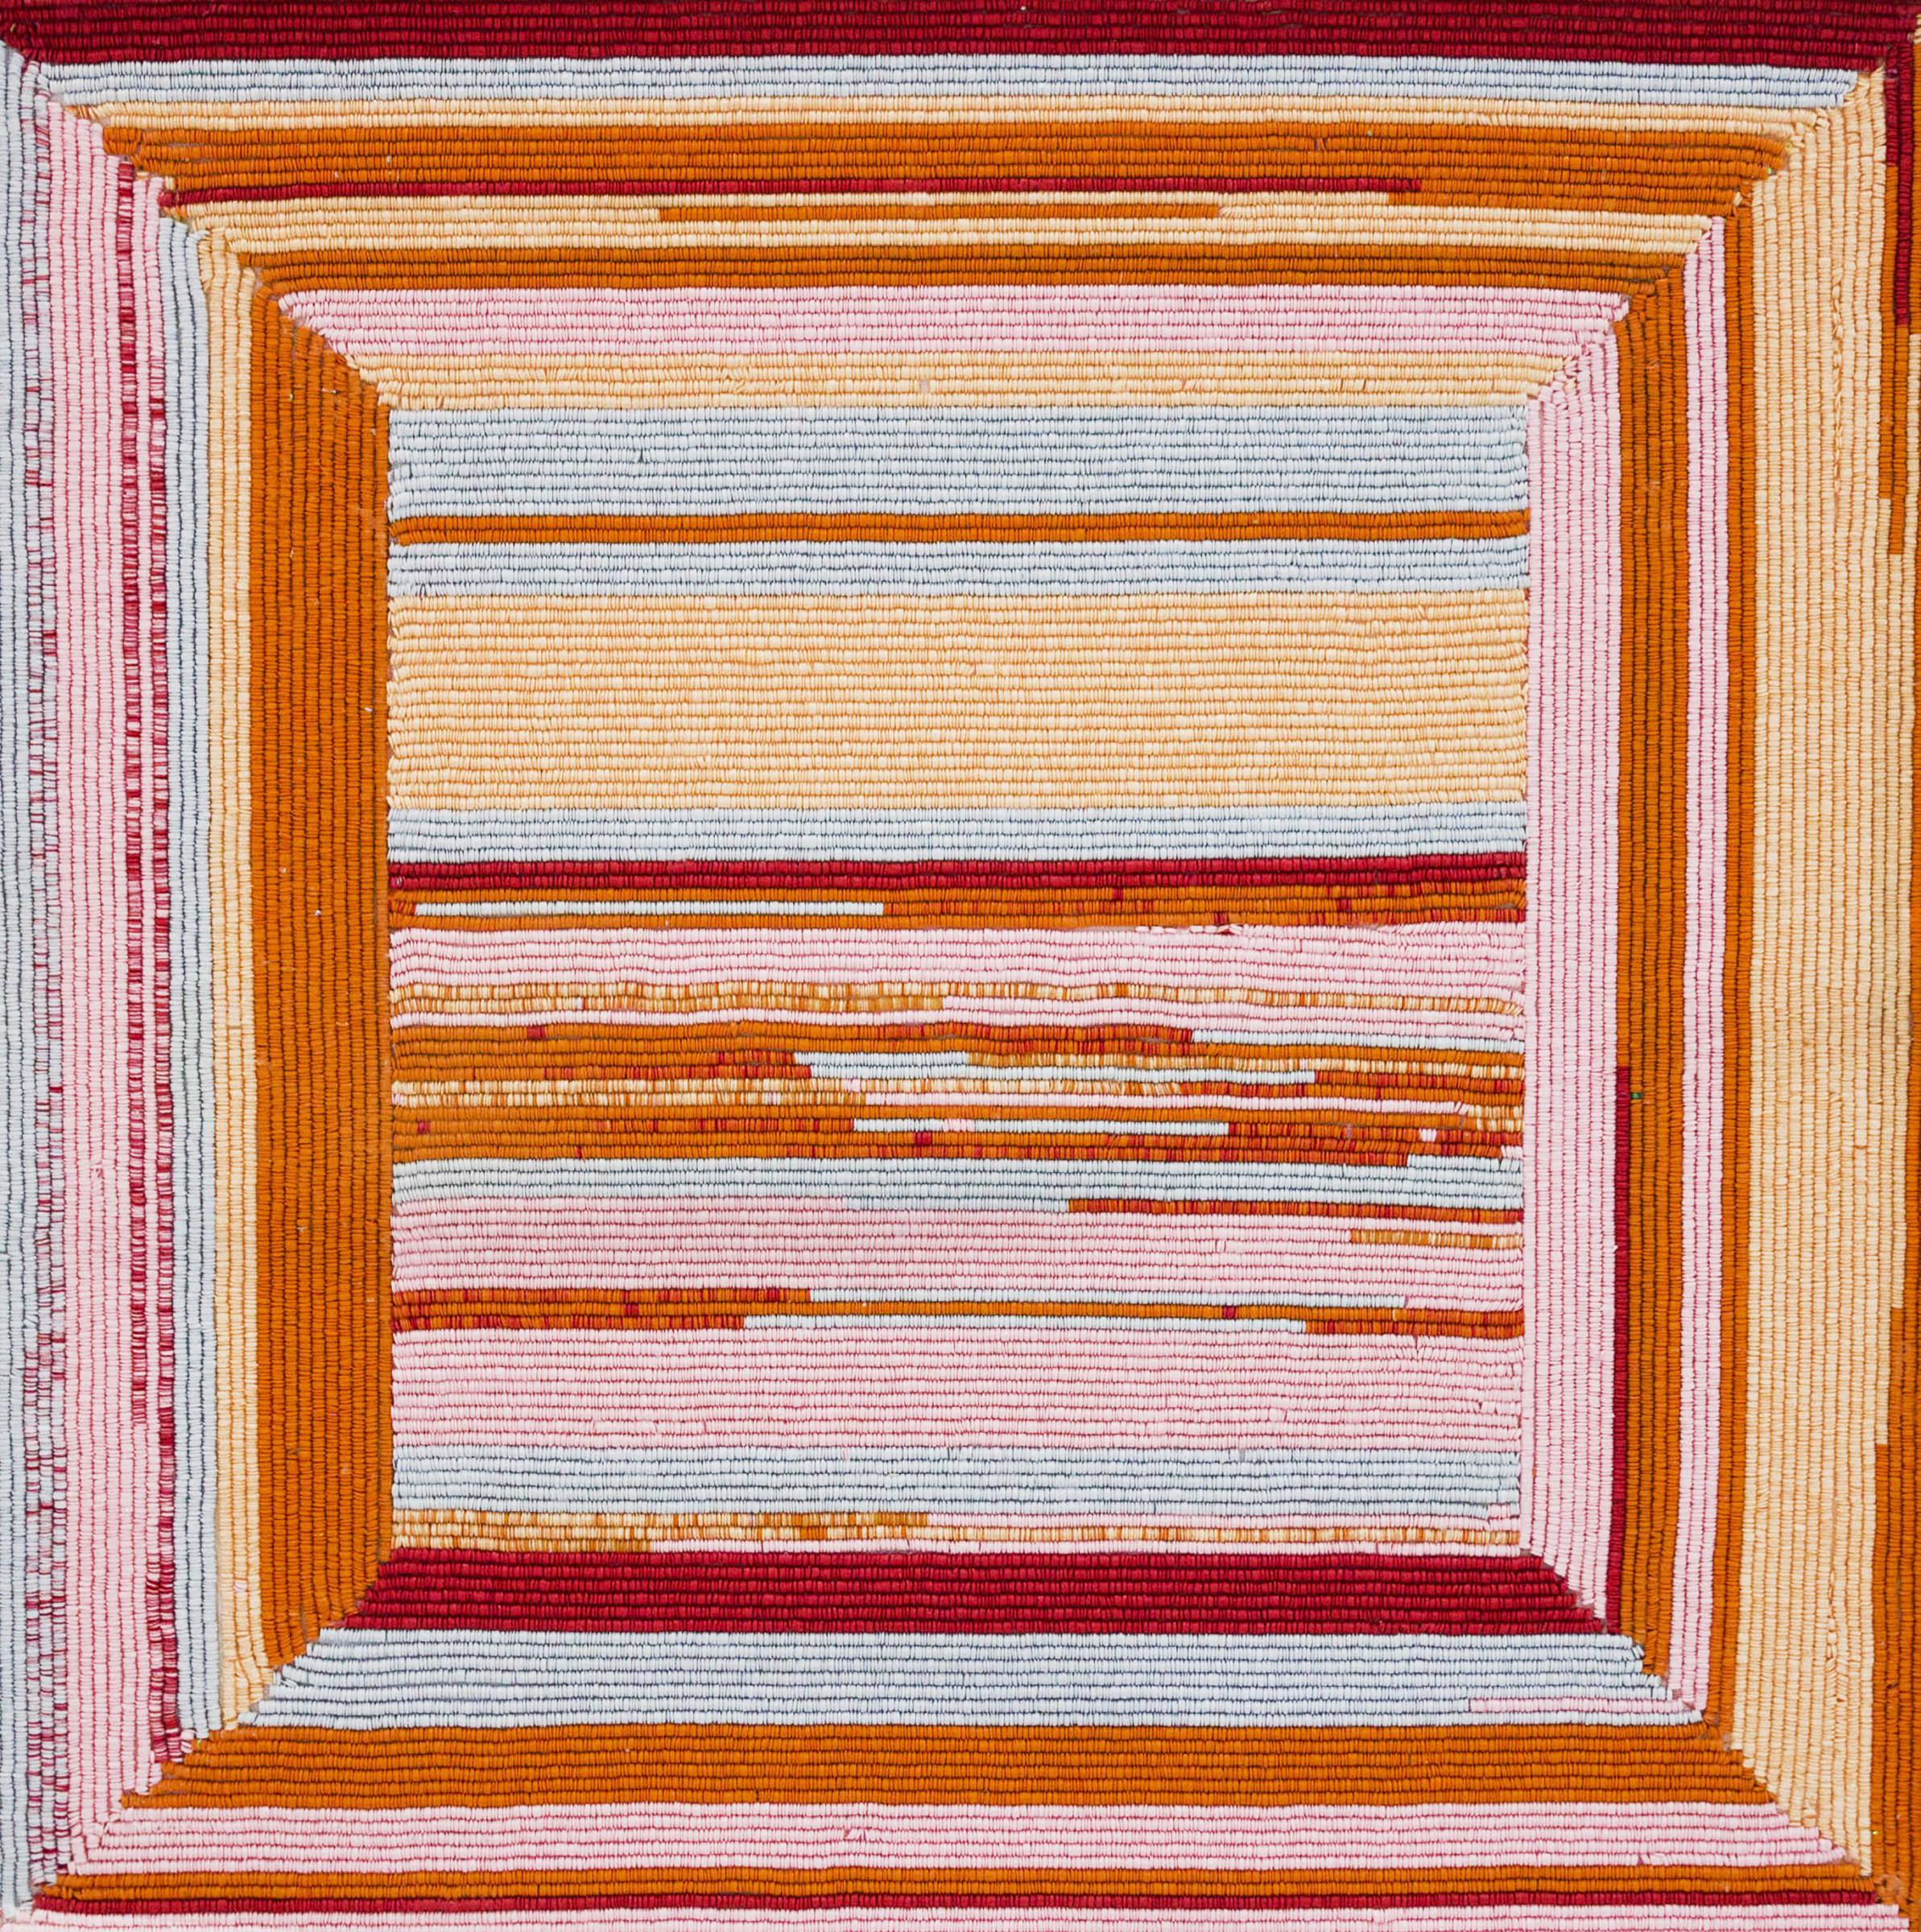 <span class=&#34;link fancybox-details-link&#34;><a href=&#34;/artists/85-leanne-shakenovsky/works/3125-leanne-shakenovsky-frame-ii-2017/&#34;>View Detail Page</a></span><div class=&#34;artist&#34;><strong>Leanne Shakenovsky</strong></div> <div class=&#34;title&#34;><em>Frame II</em>, 2017</div> <div class=&#34;medium&#34;>Sequins, Fishing Line & Wood Glue</div> <div class=&#34;dimensions&#34;>100cm x 100cm</div><div class=&#34;price&#34;>R28,000.00</div>